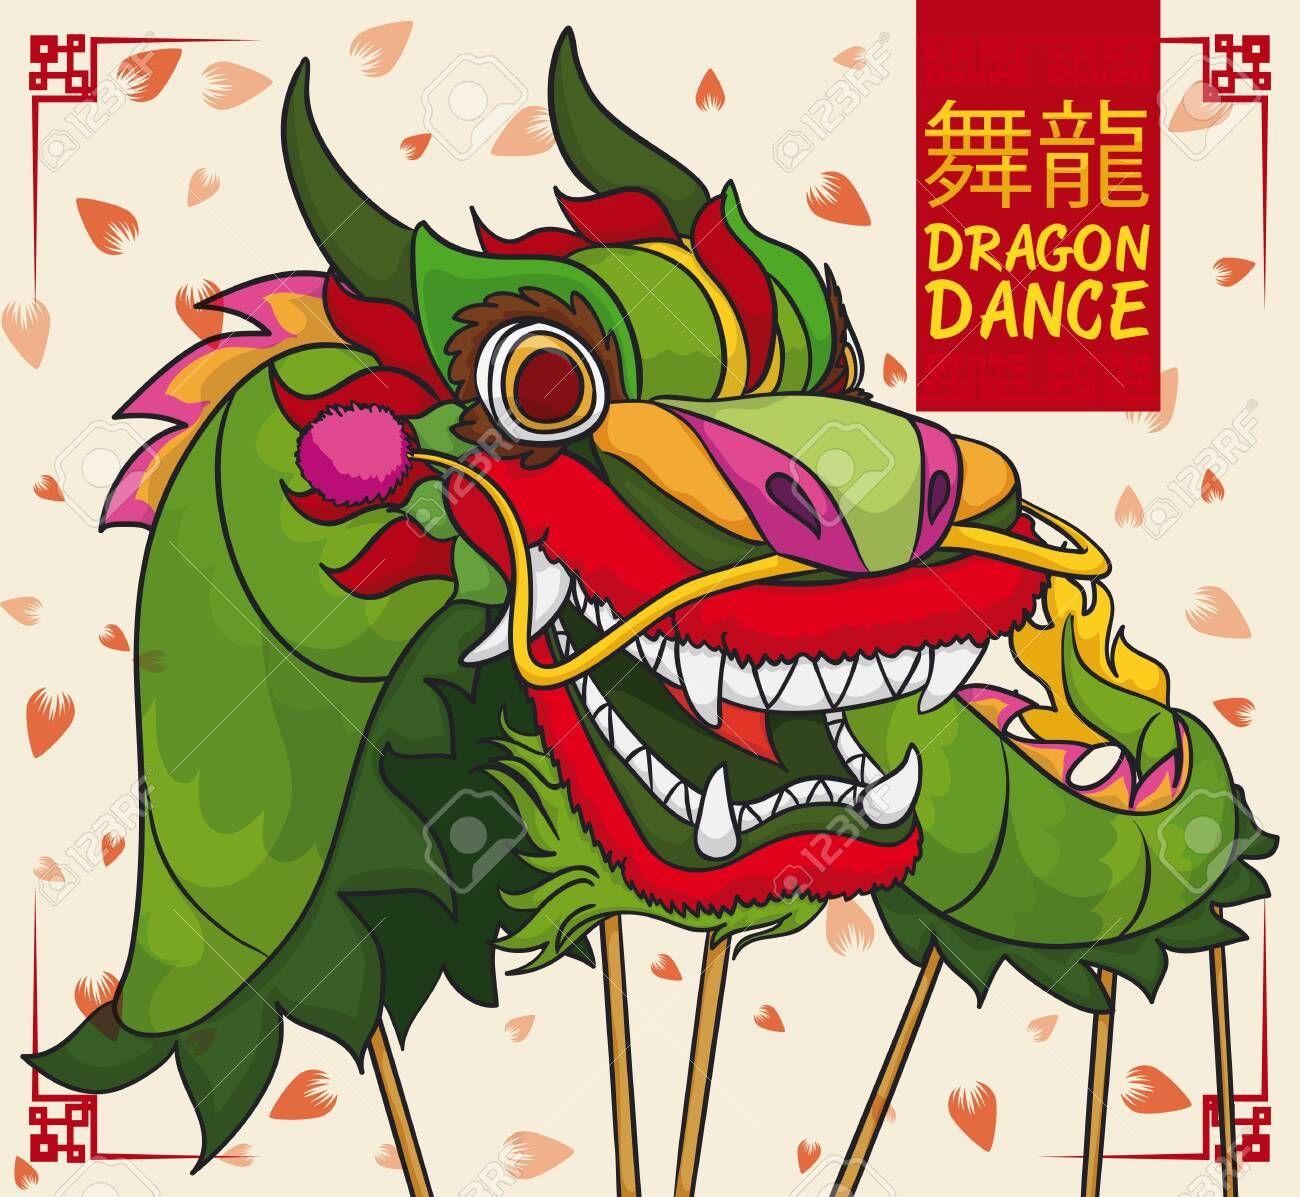 Cartoon poster with beautiful Chinese green dragon dancing